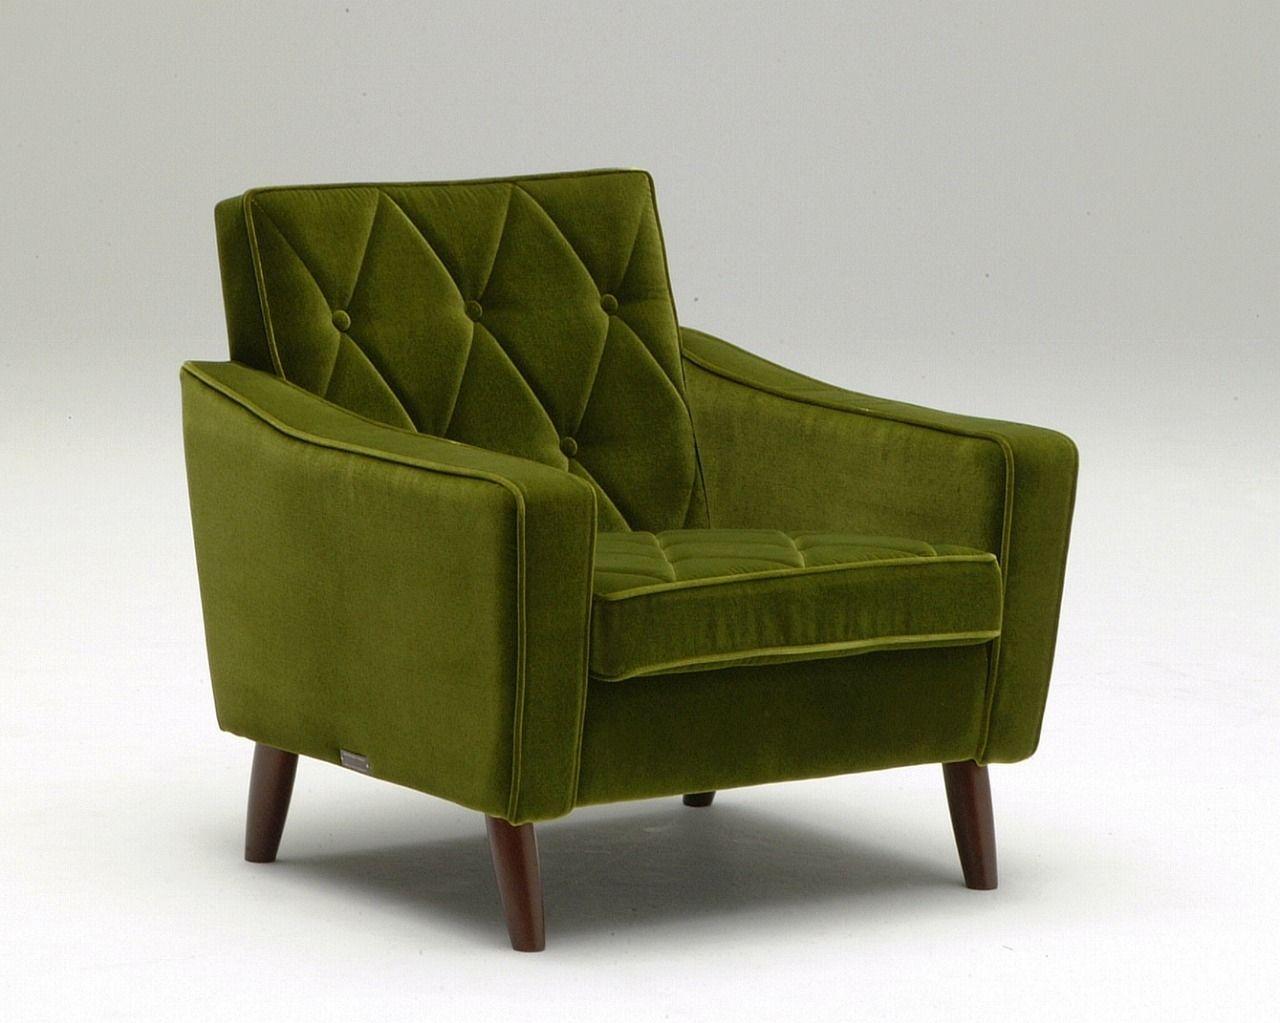 Sofa Samt Grün klassischer sessel samt holz schwarz lobby karimoku